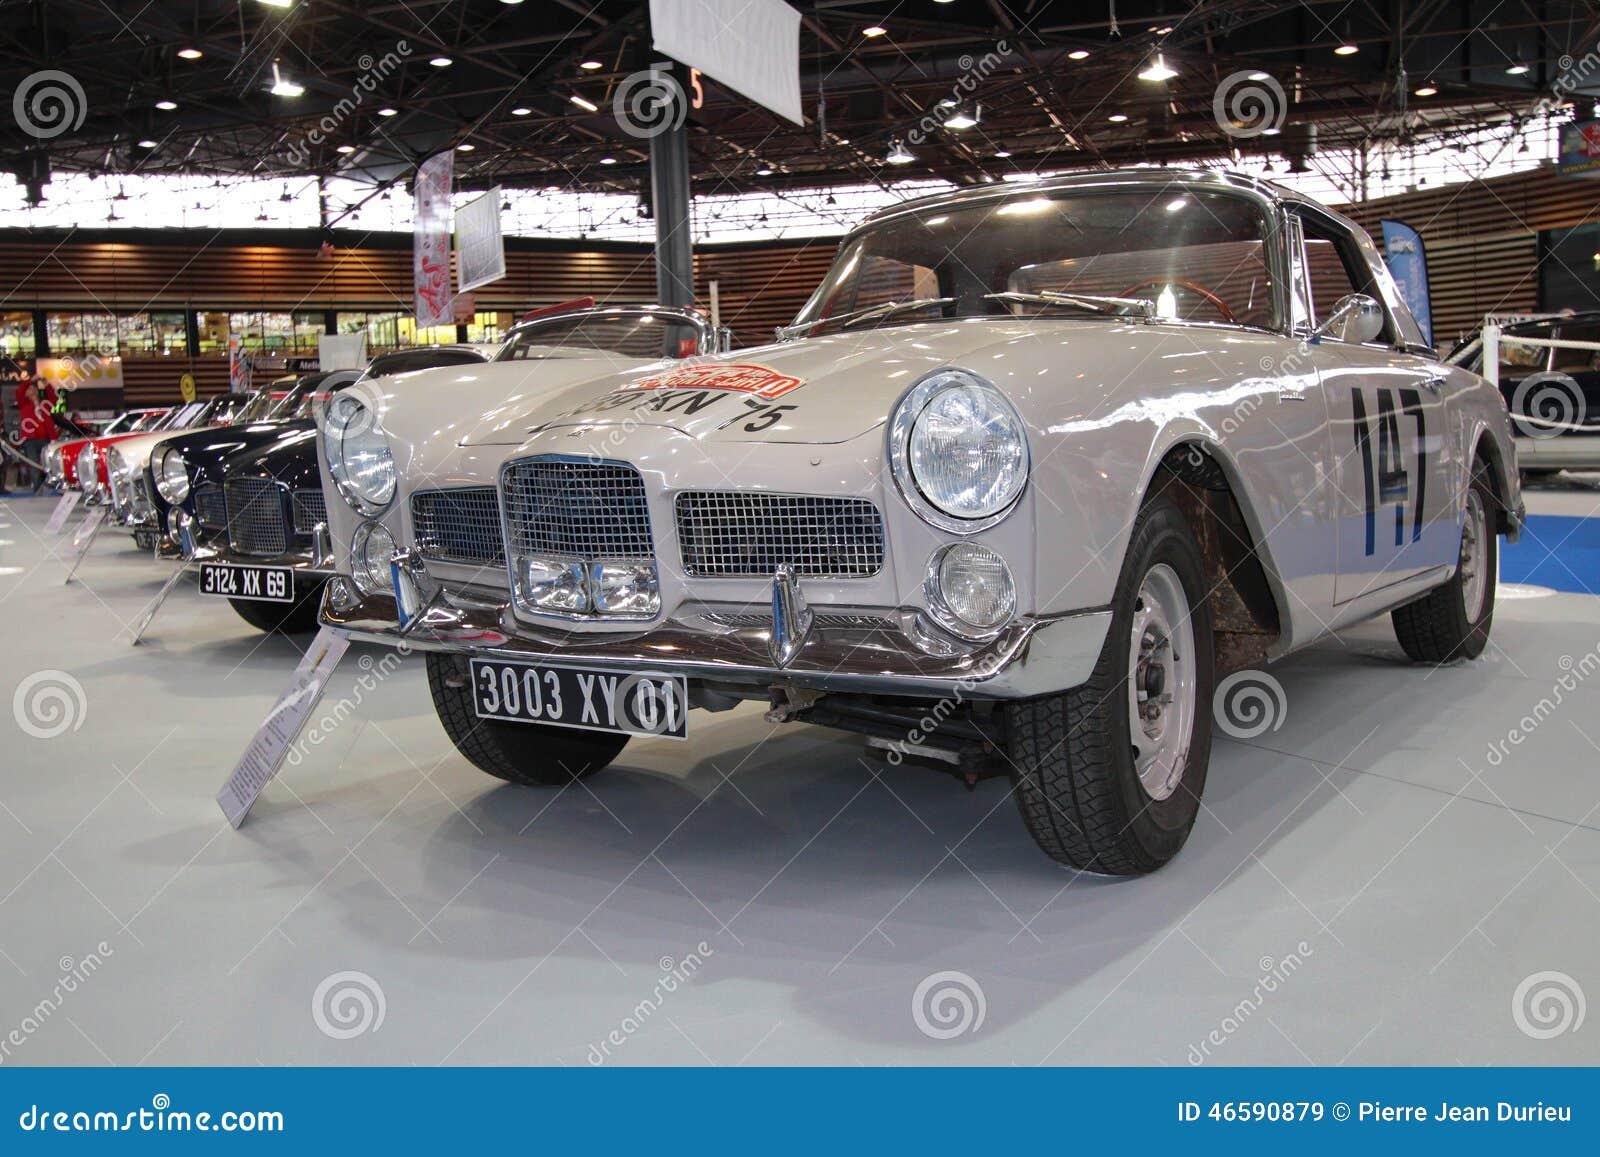 this facel vega sport car entered 1961 monte carlo rally editorial stock image image 46590879. Black Bedroom Furniture Sets. Home Design Ideas